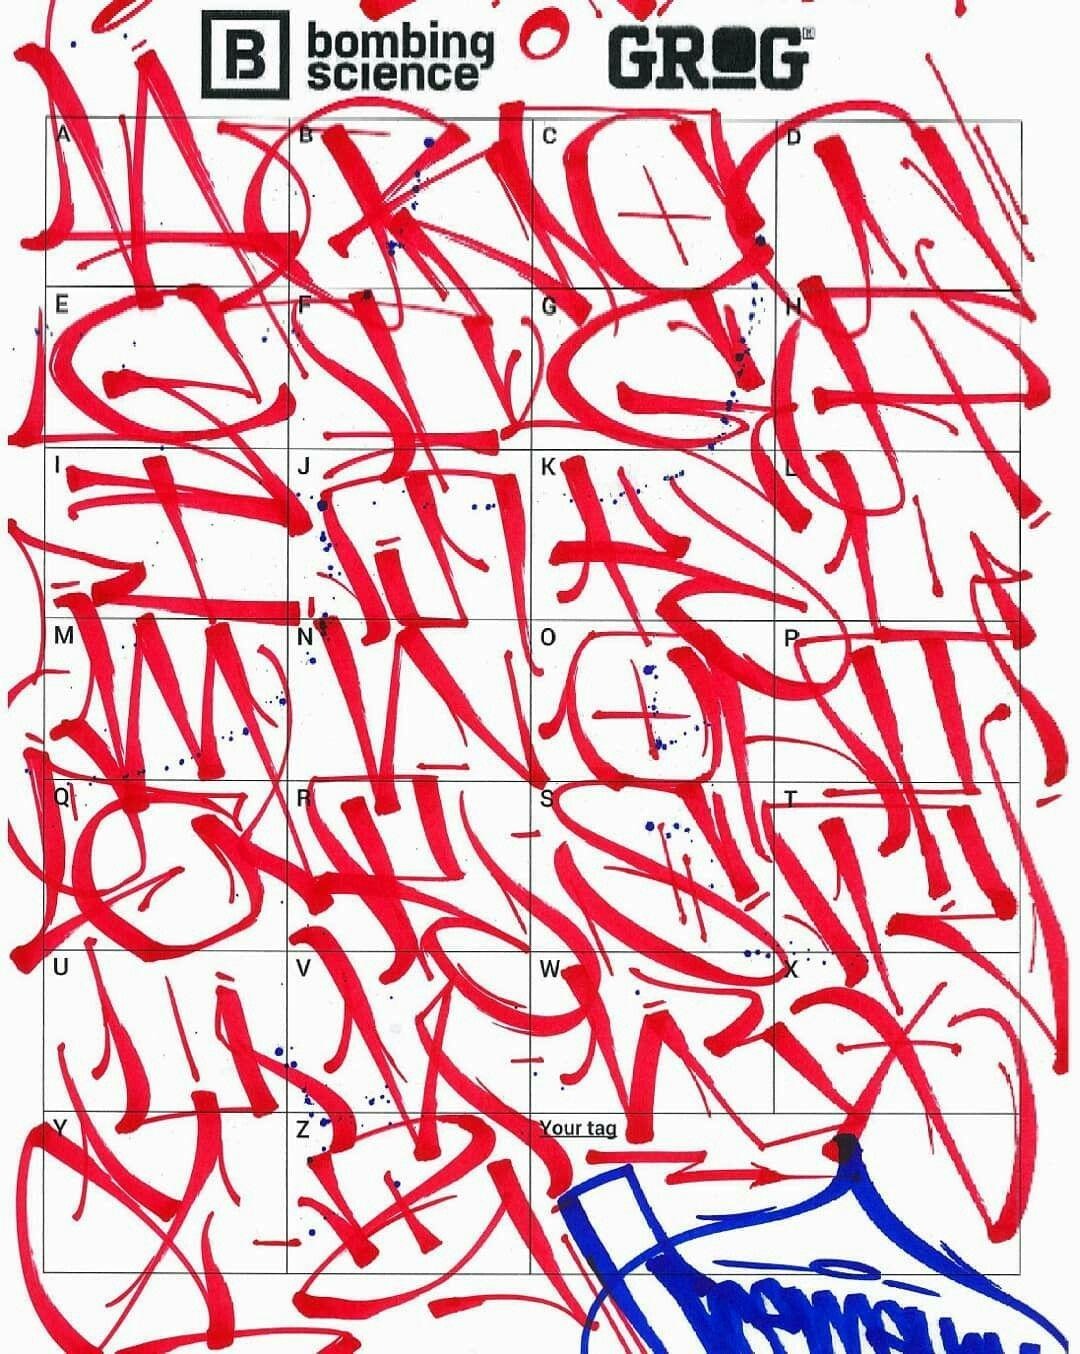 Script Letras Graffiti Letras Para Tatuajes Graffitis Letras